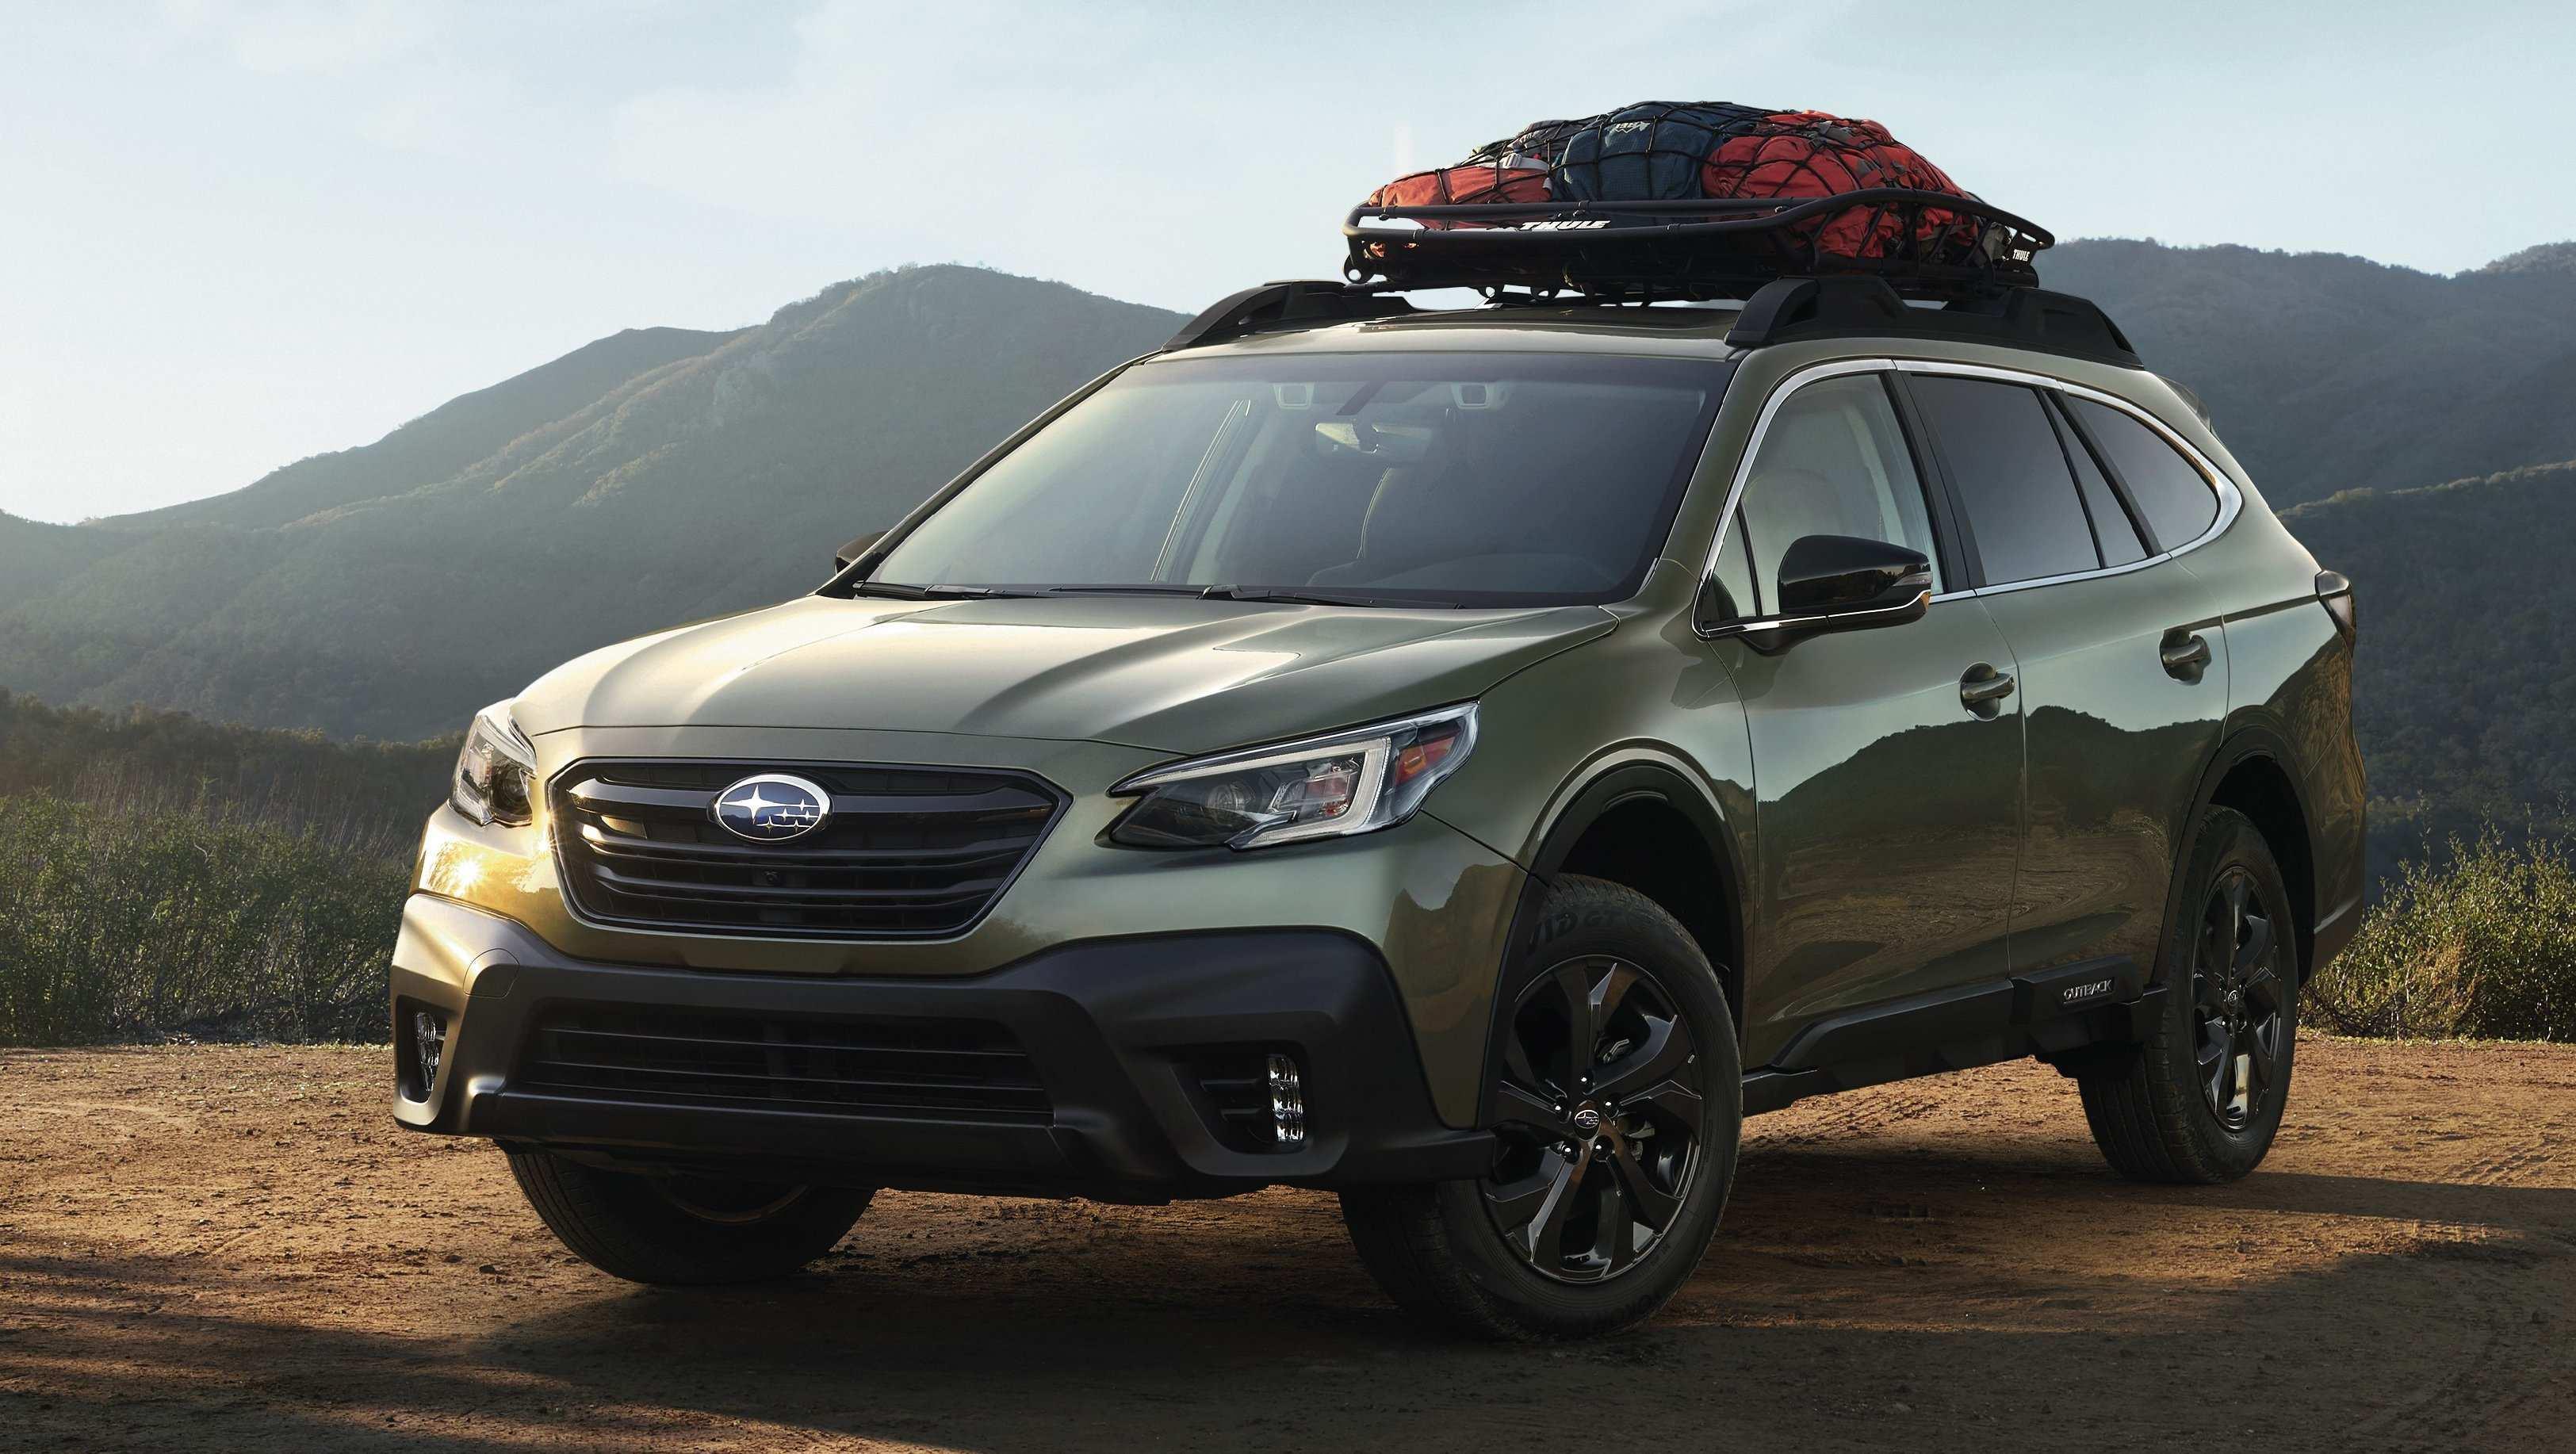 82 Best Review Subaru Suv 2020 Exterior and Interior with Subaru Suv 2020